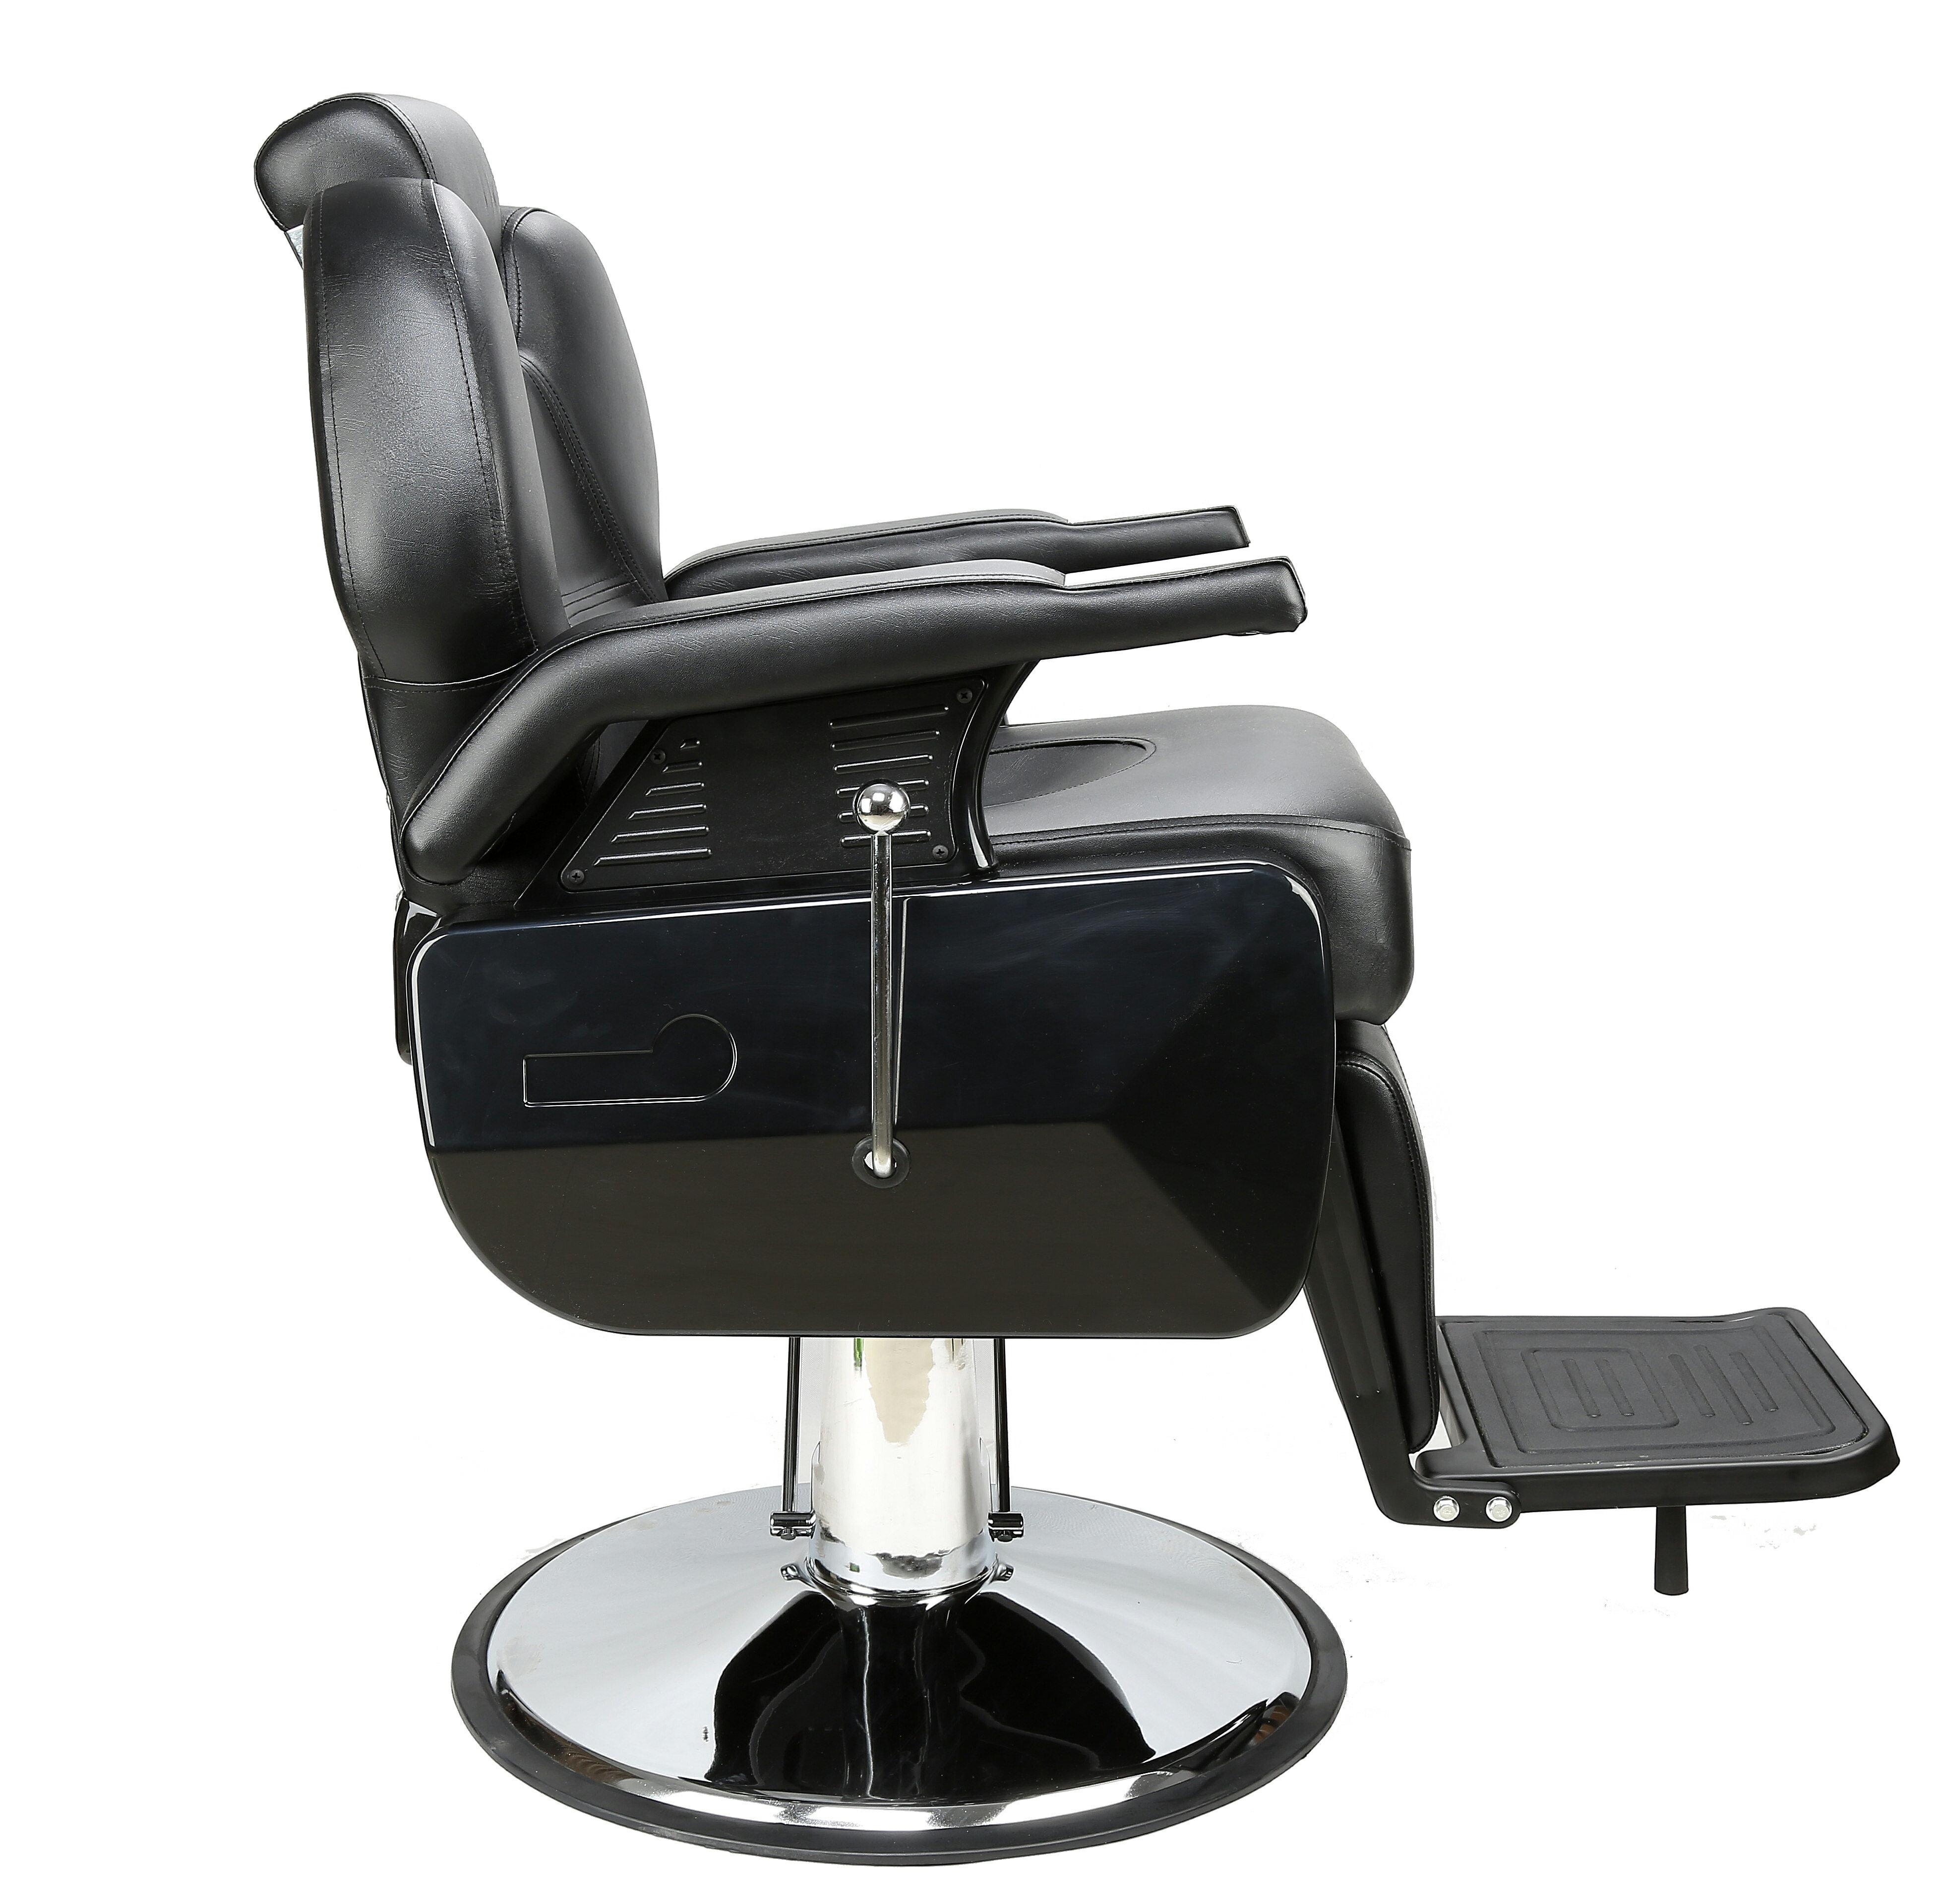 BarberPub All Purpose Hydraulic Recline Salon Beauty Spa Styling Barber Chair Black 3